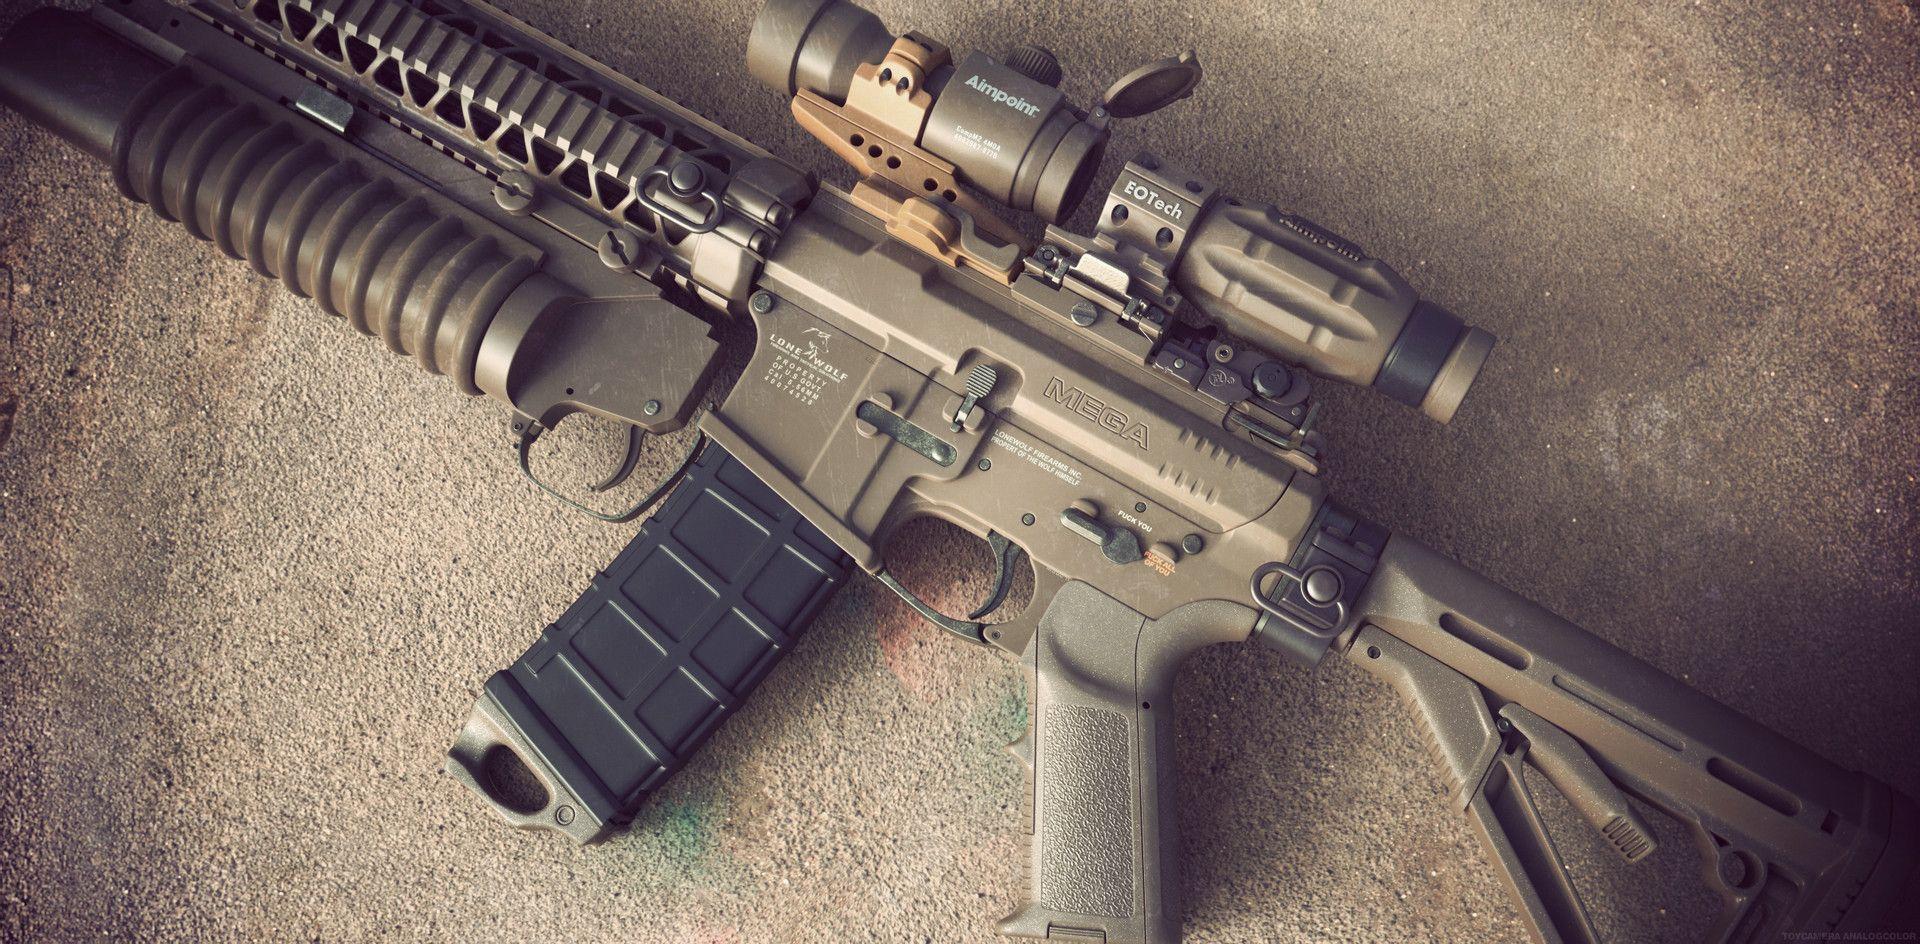 ArtStation - Tan Mega Arms AR15, Reno Levi